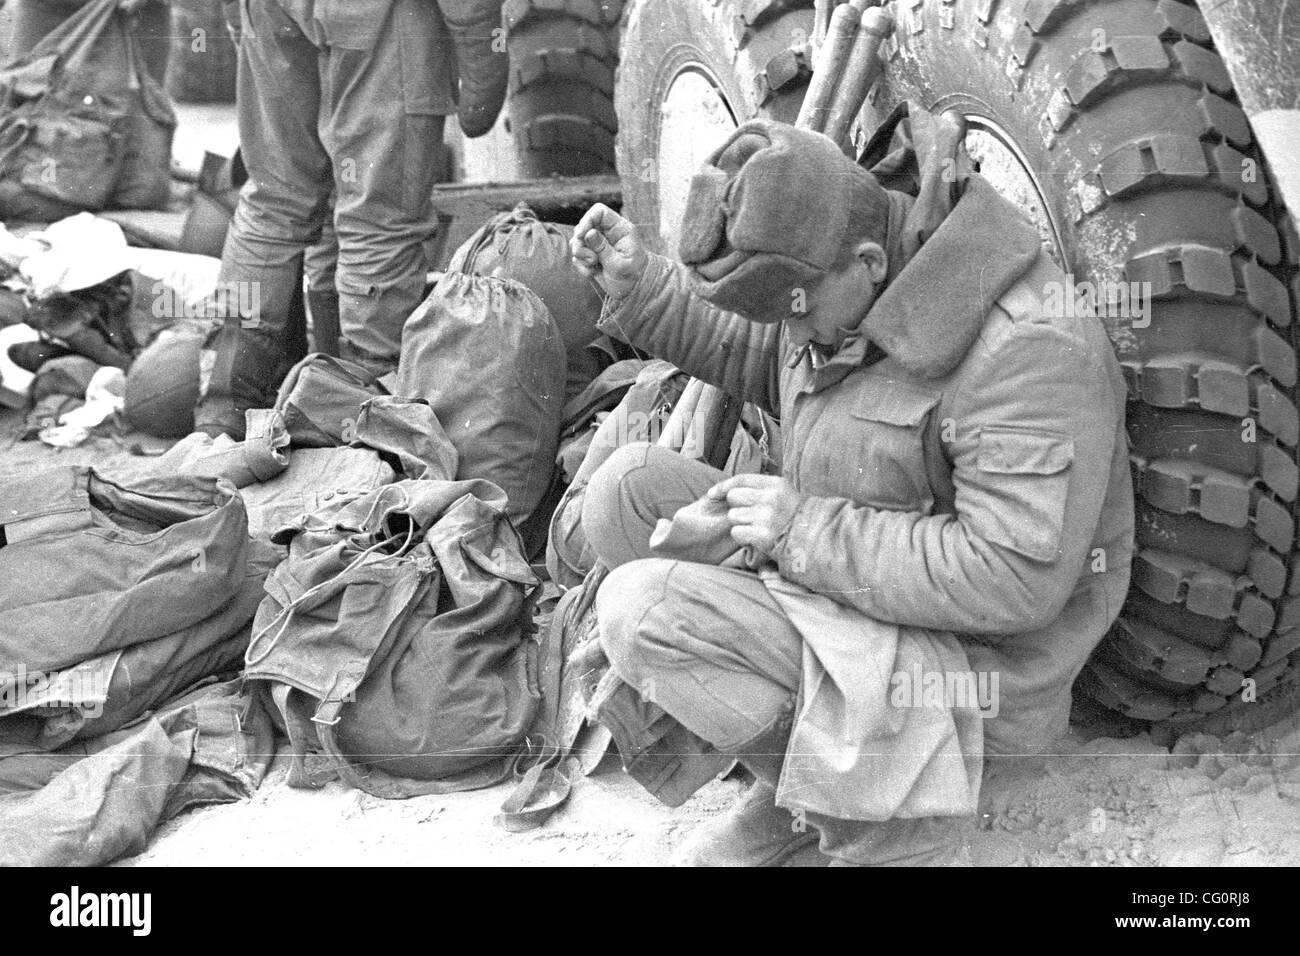 Soviet Afghanistan war - Page 6 Jul-12-2007-kabul-afghanistan-the-soviet-war-in-afghanistan-was-a-CG0RJ8